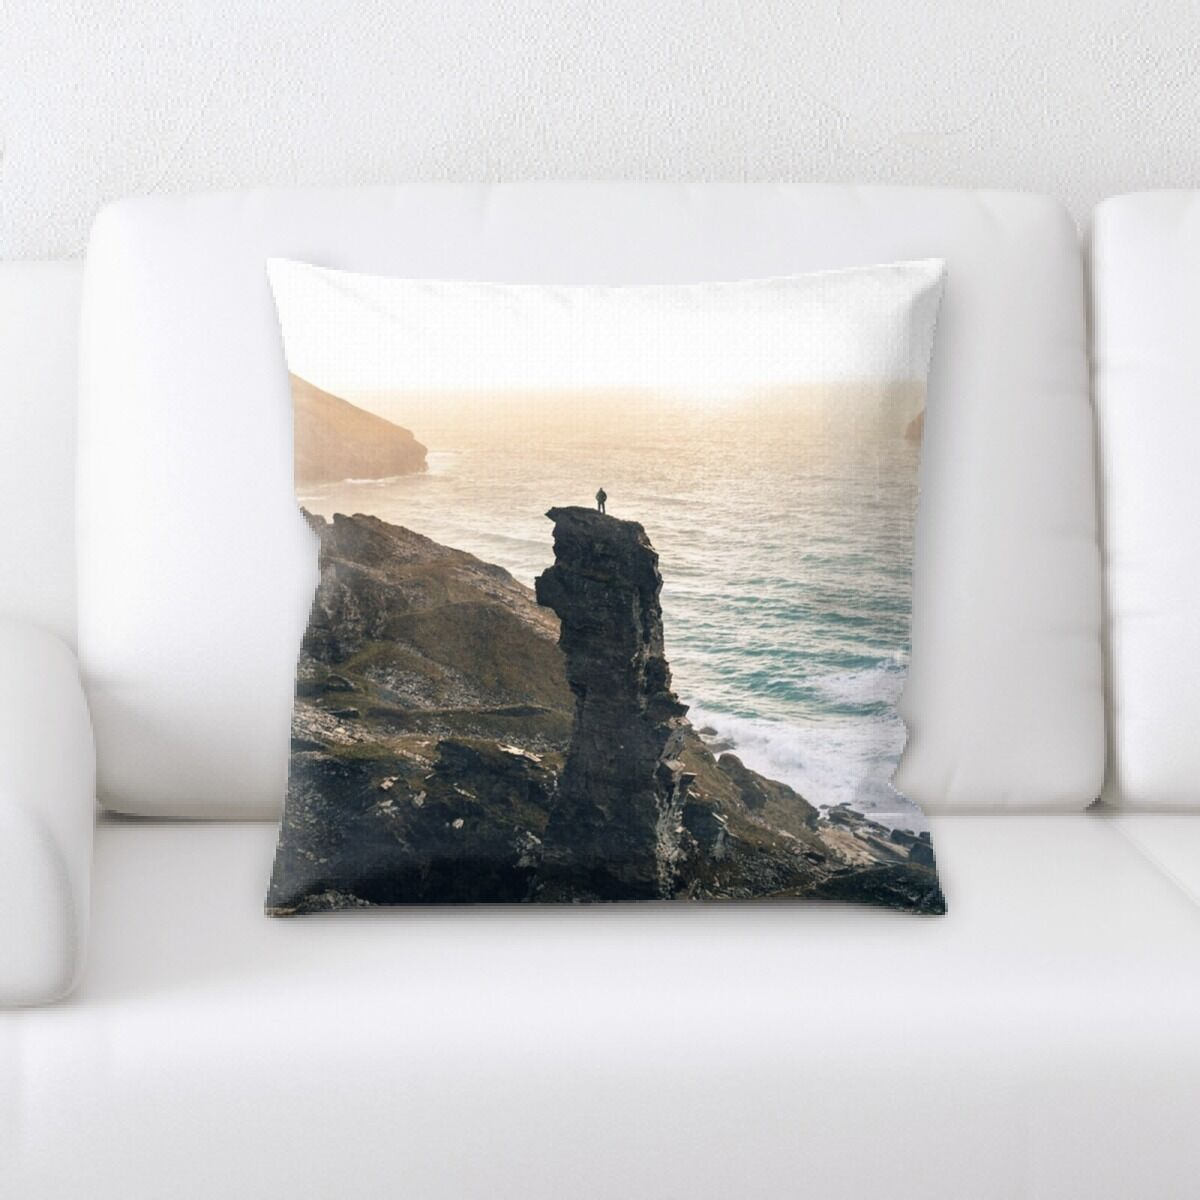 Lusk Mountain and Cliffs (150) Throw Pillow